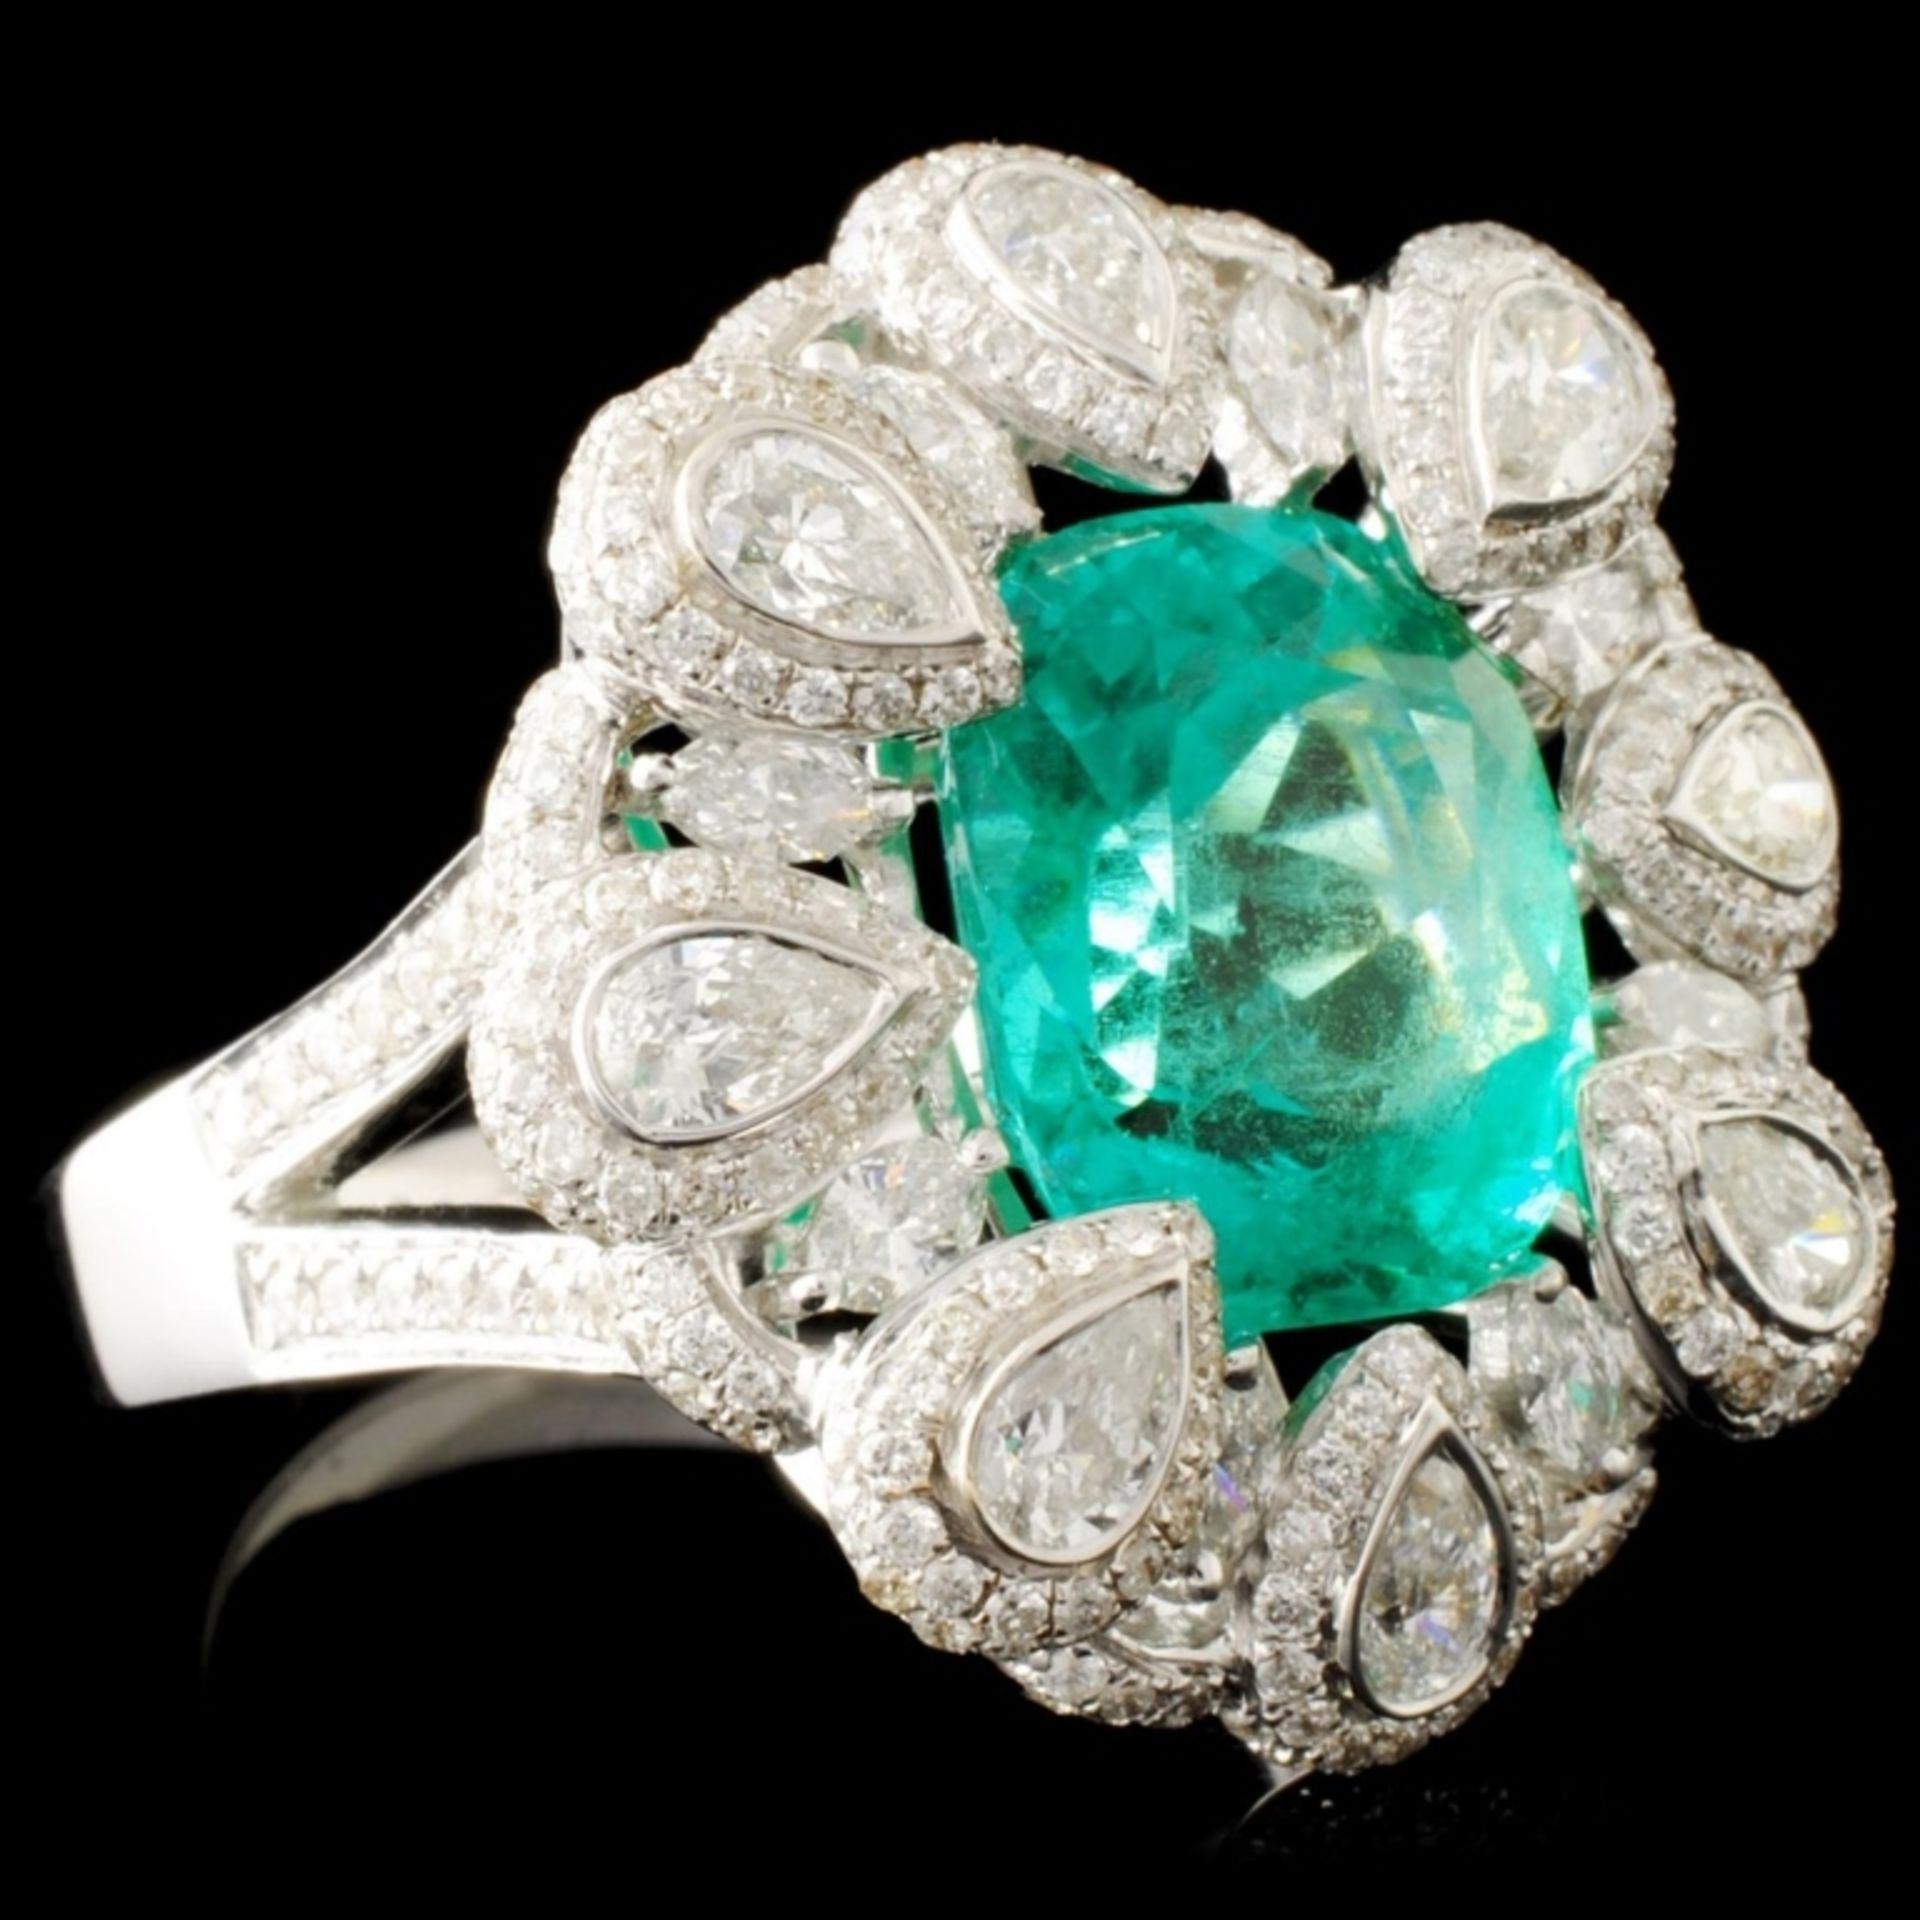 18K Gold 4.83ct Emerald & 2.02ctw Diamond Ring - Image 3 of 5